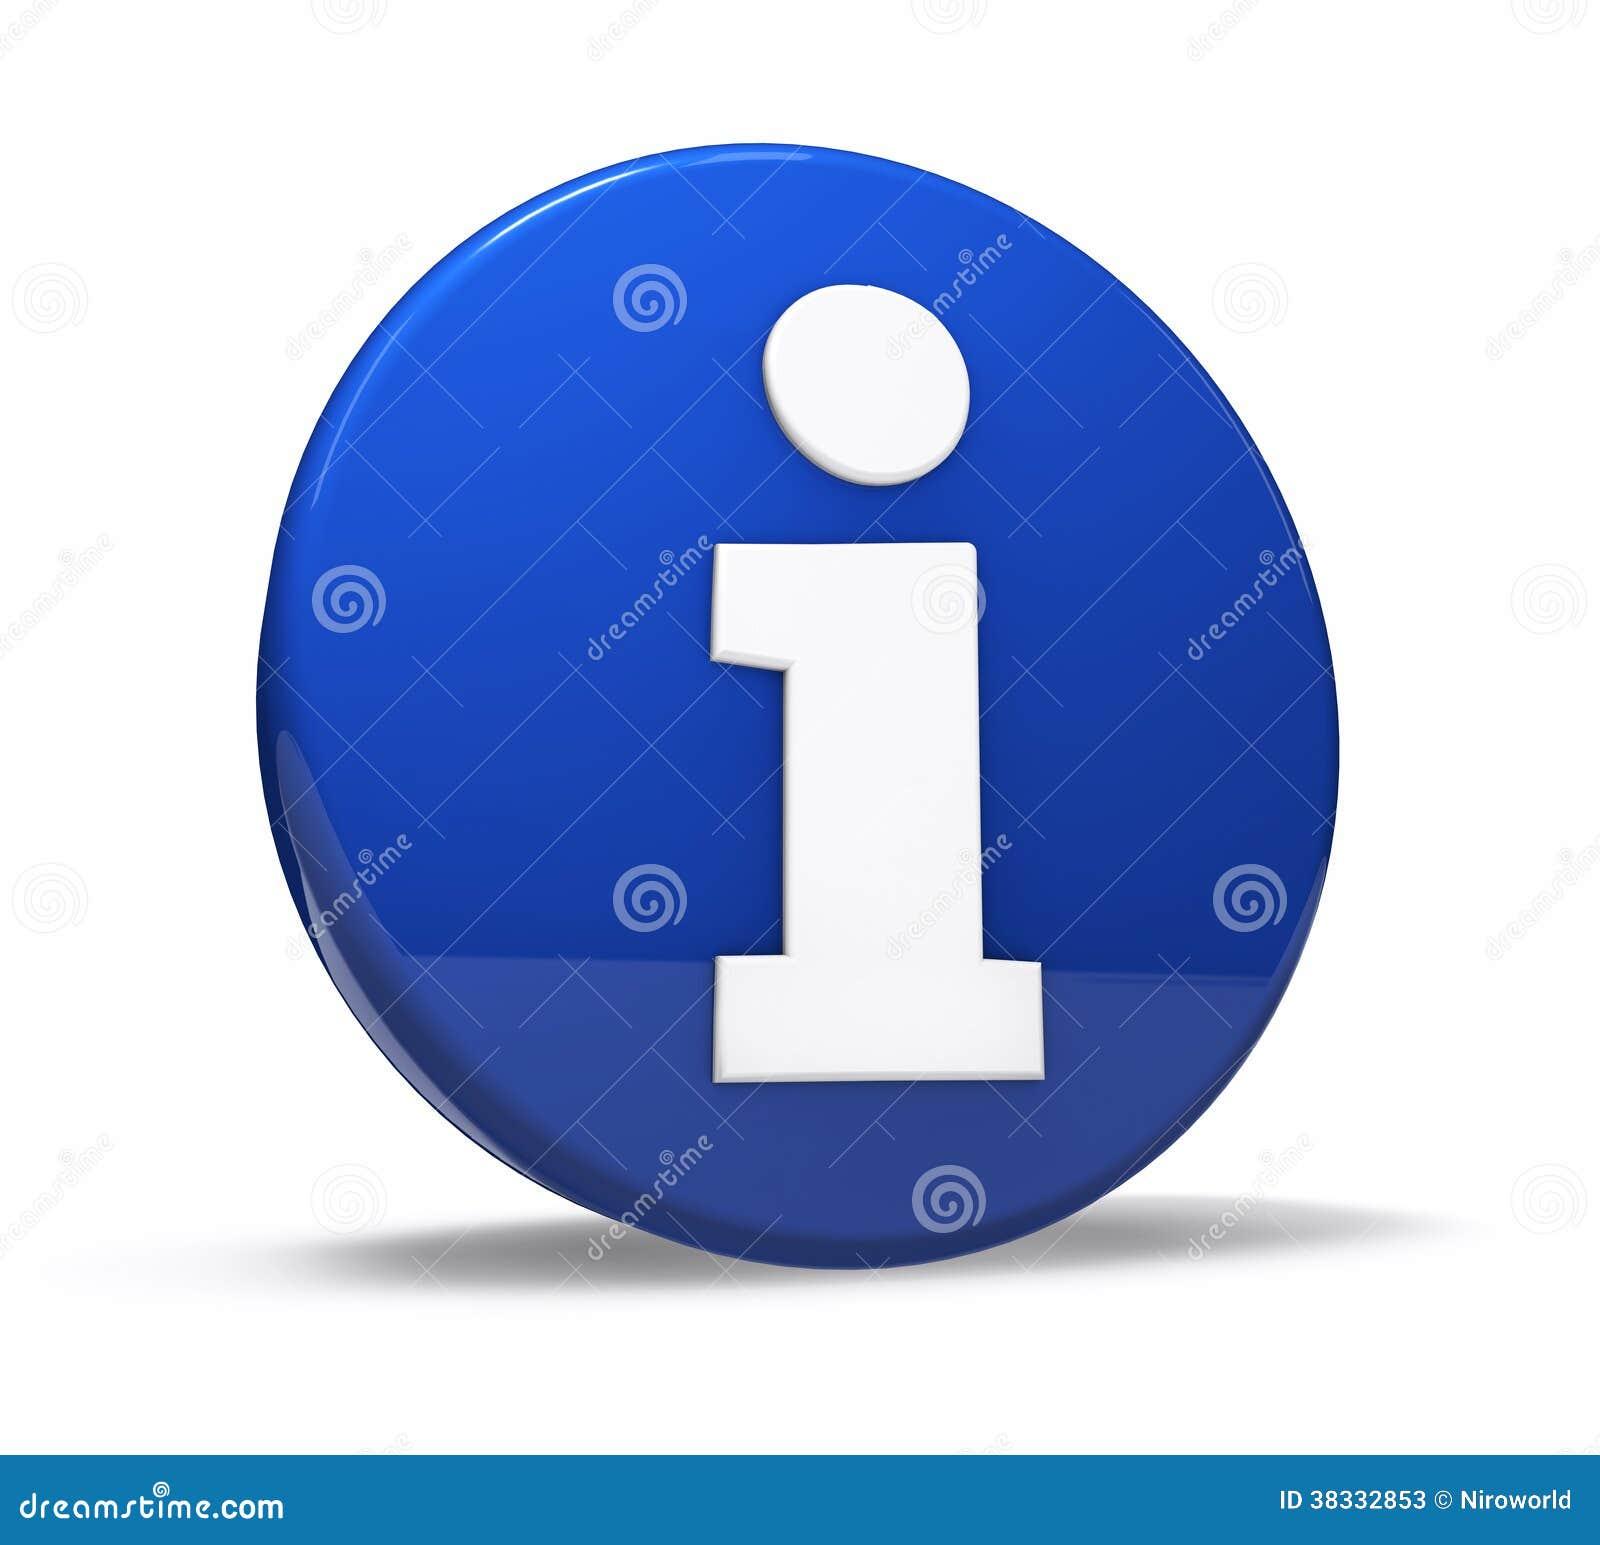 Information Site: Info Symbol Web Button Stock Illustration. Illustration Of